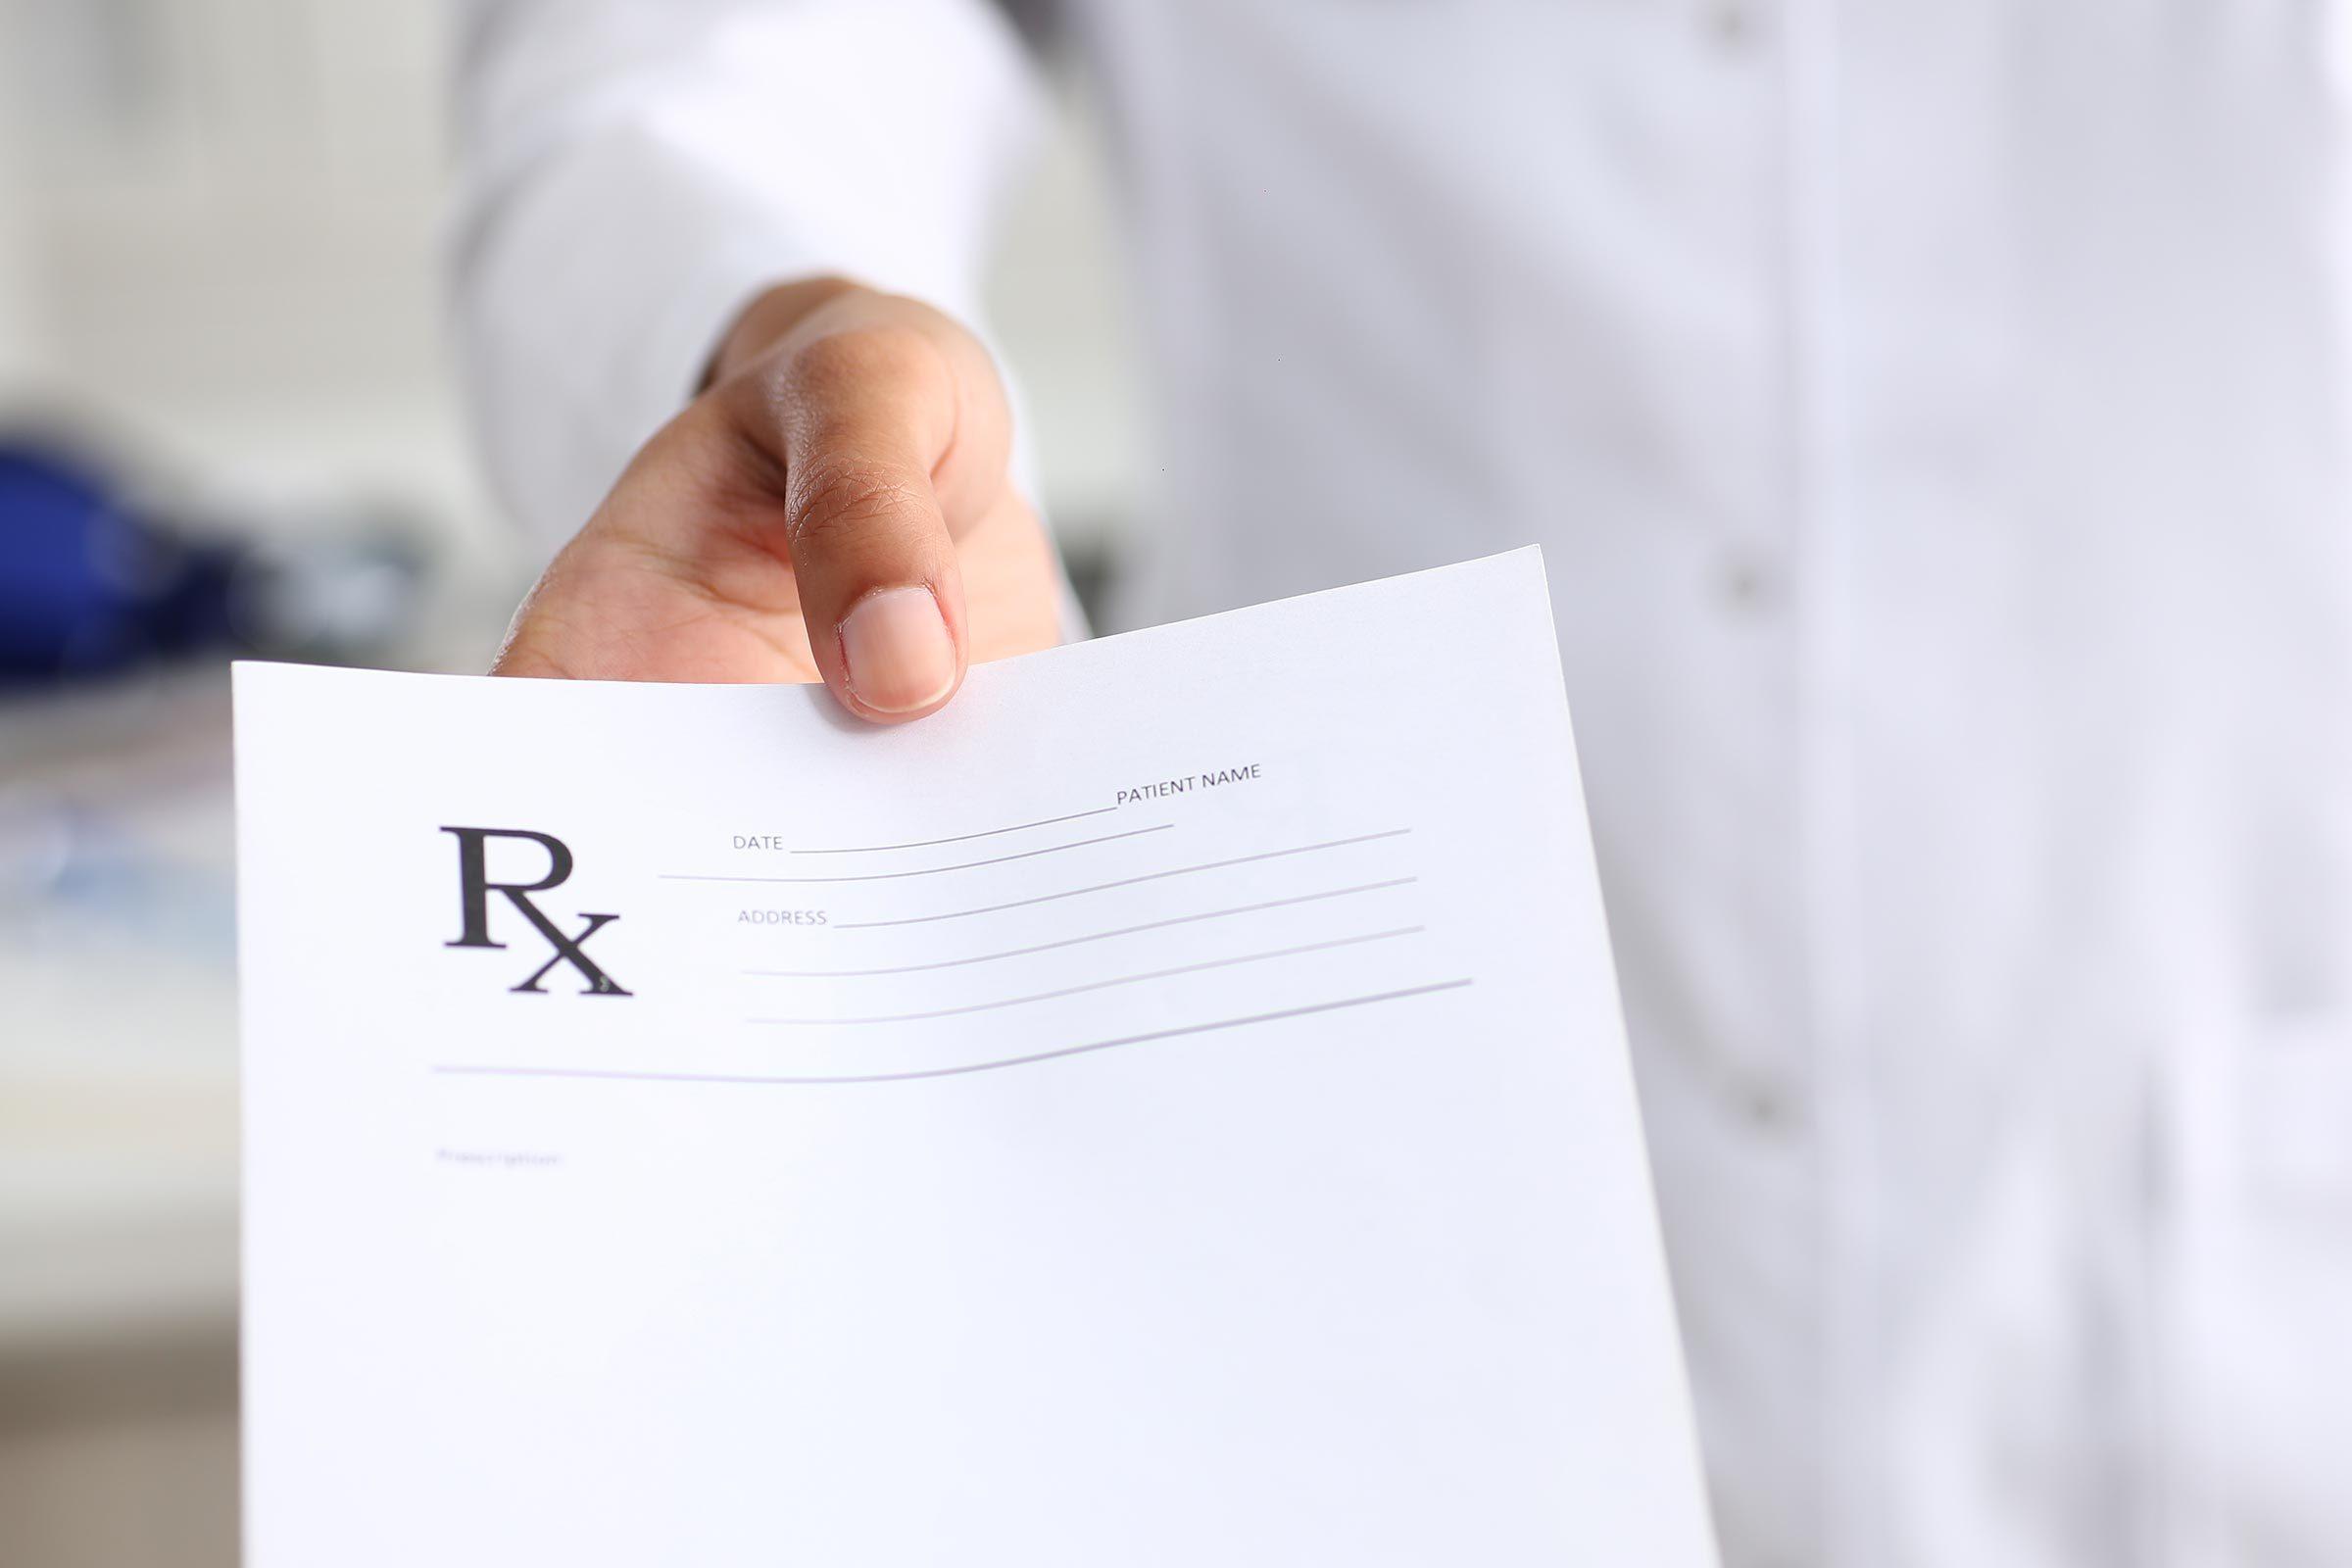 rx prescription pad doctor